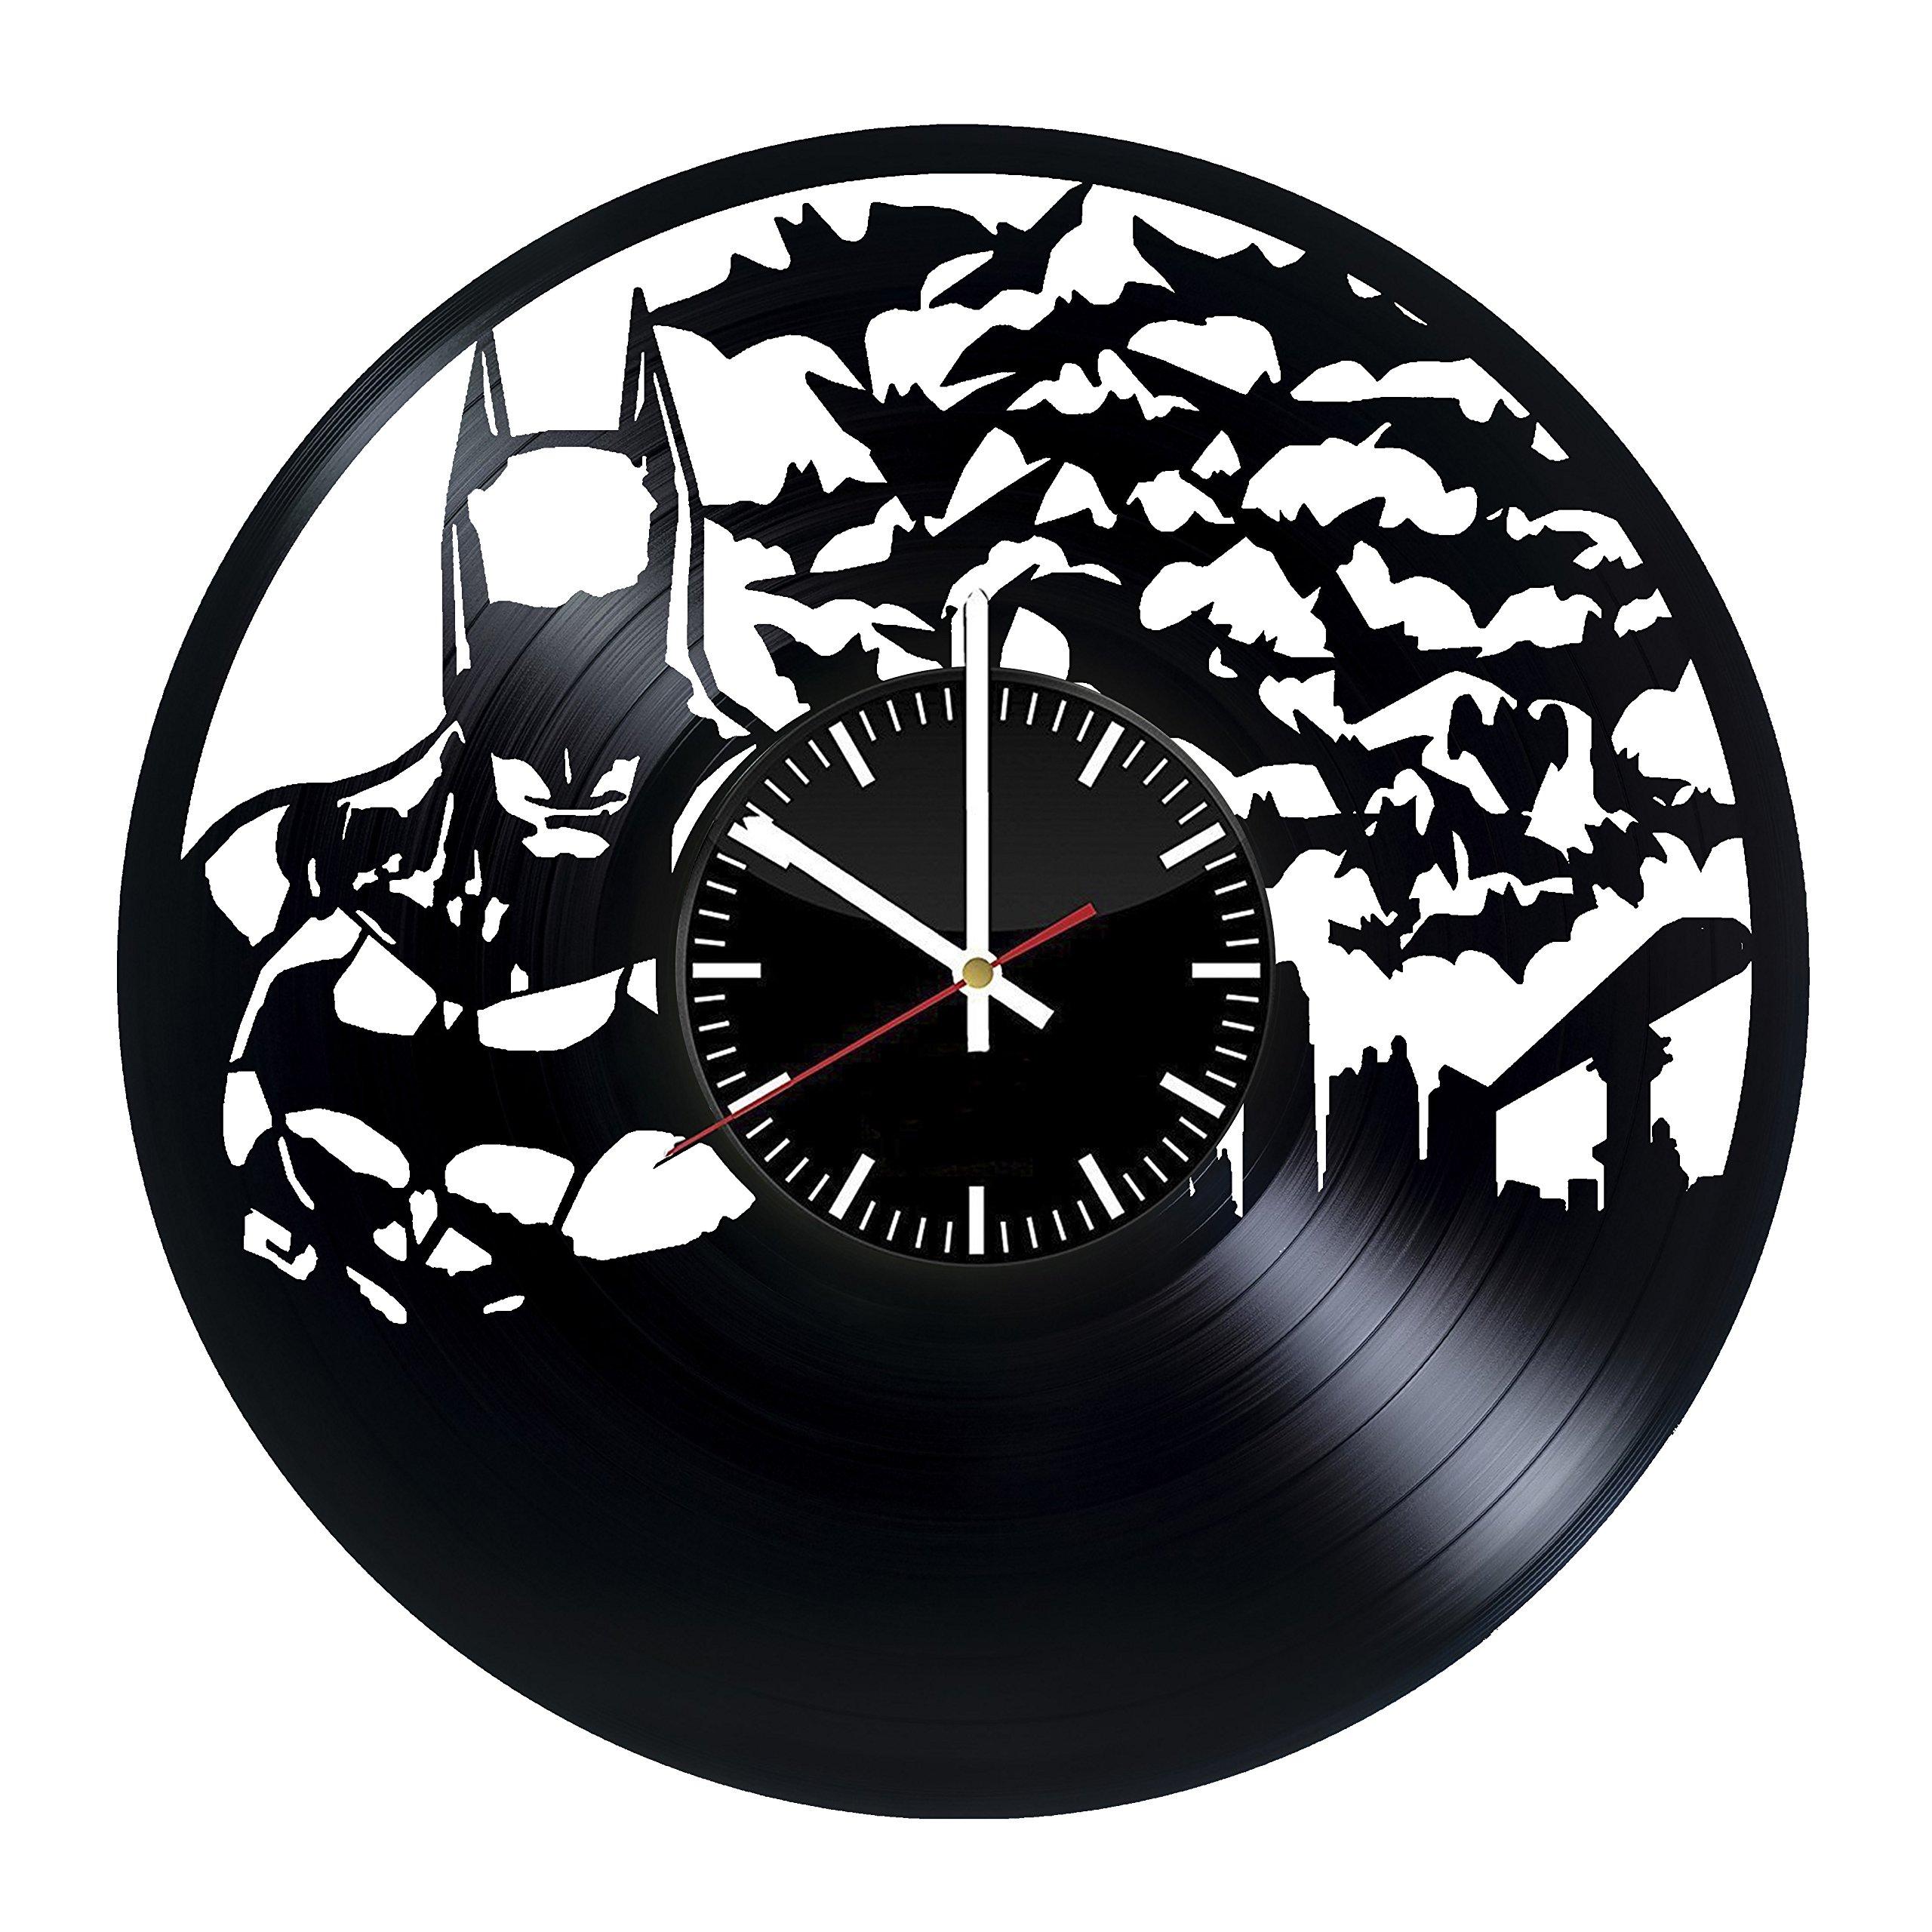 Welcome Everyday Arts Batman Movie Vinyl Record Wall Clock - Get unique living room wall decor - Gift ideas for men and women – DC Comics Unique Modern Art